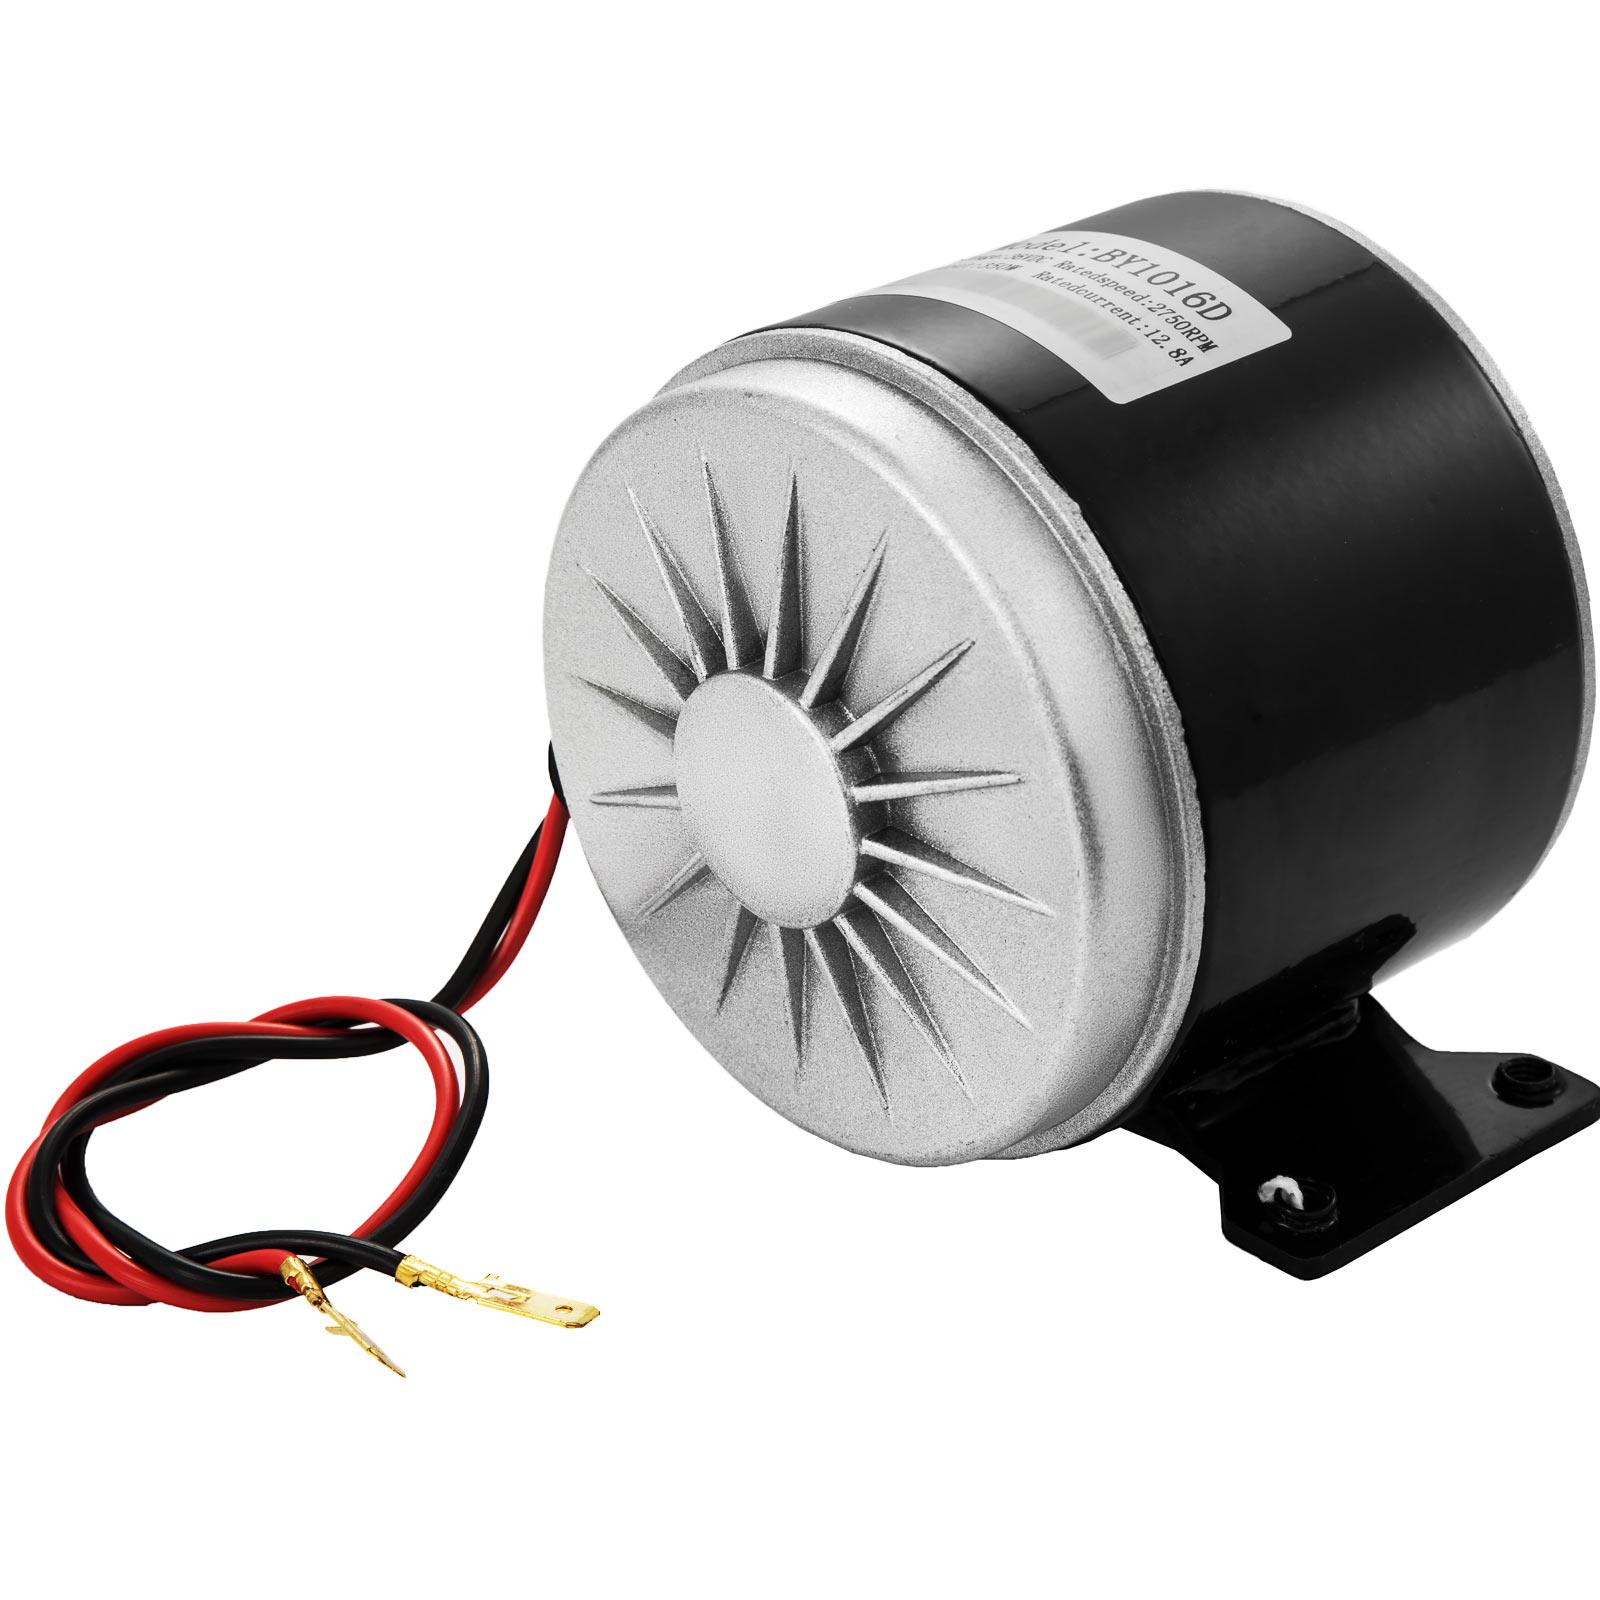 DC-electric-motor-12-60V-150W-2KW-for-scooter-bike-go-kart-minibike-e-ATV thumbnail 84